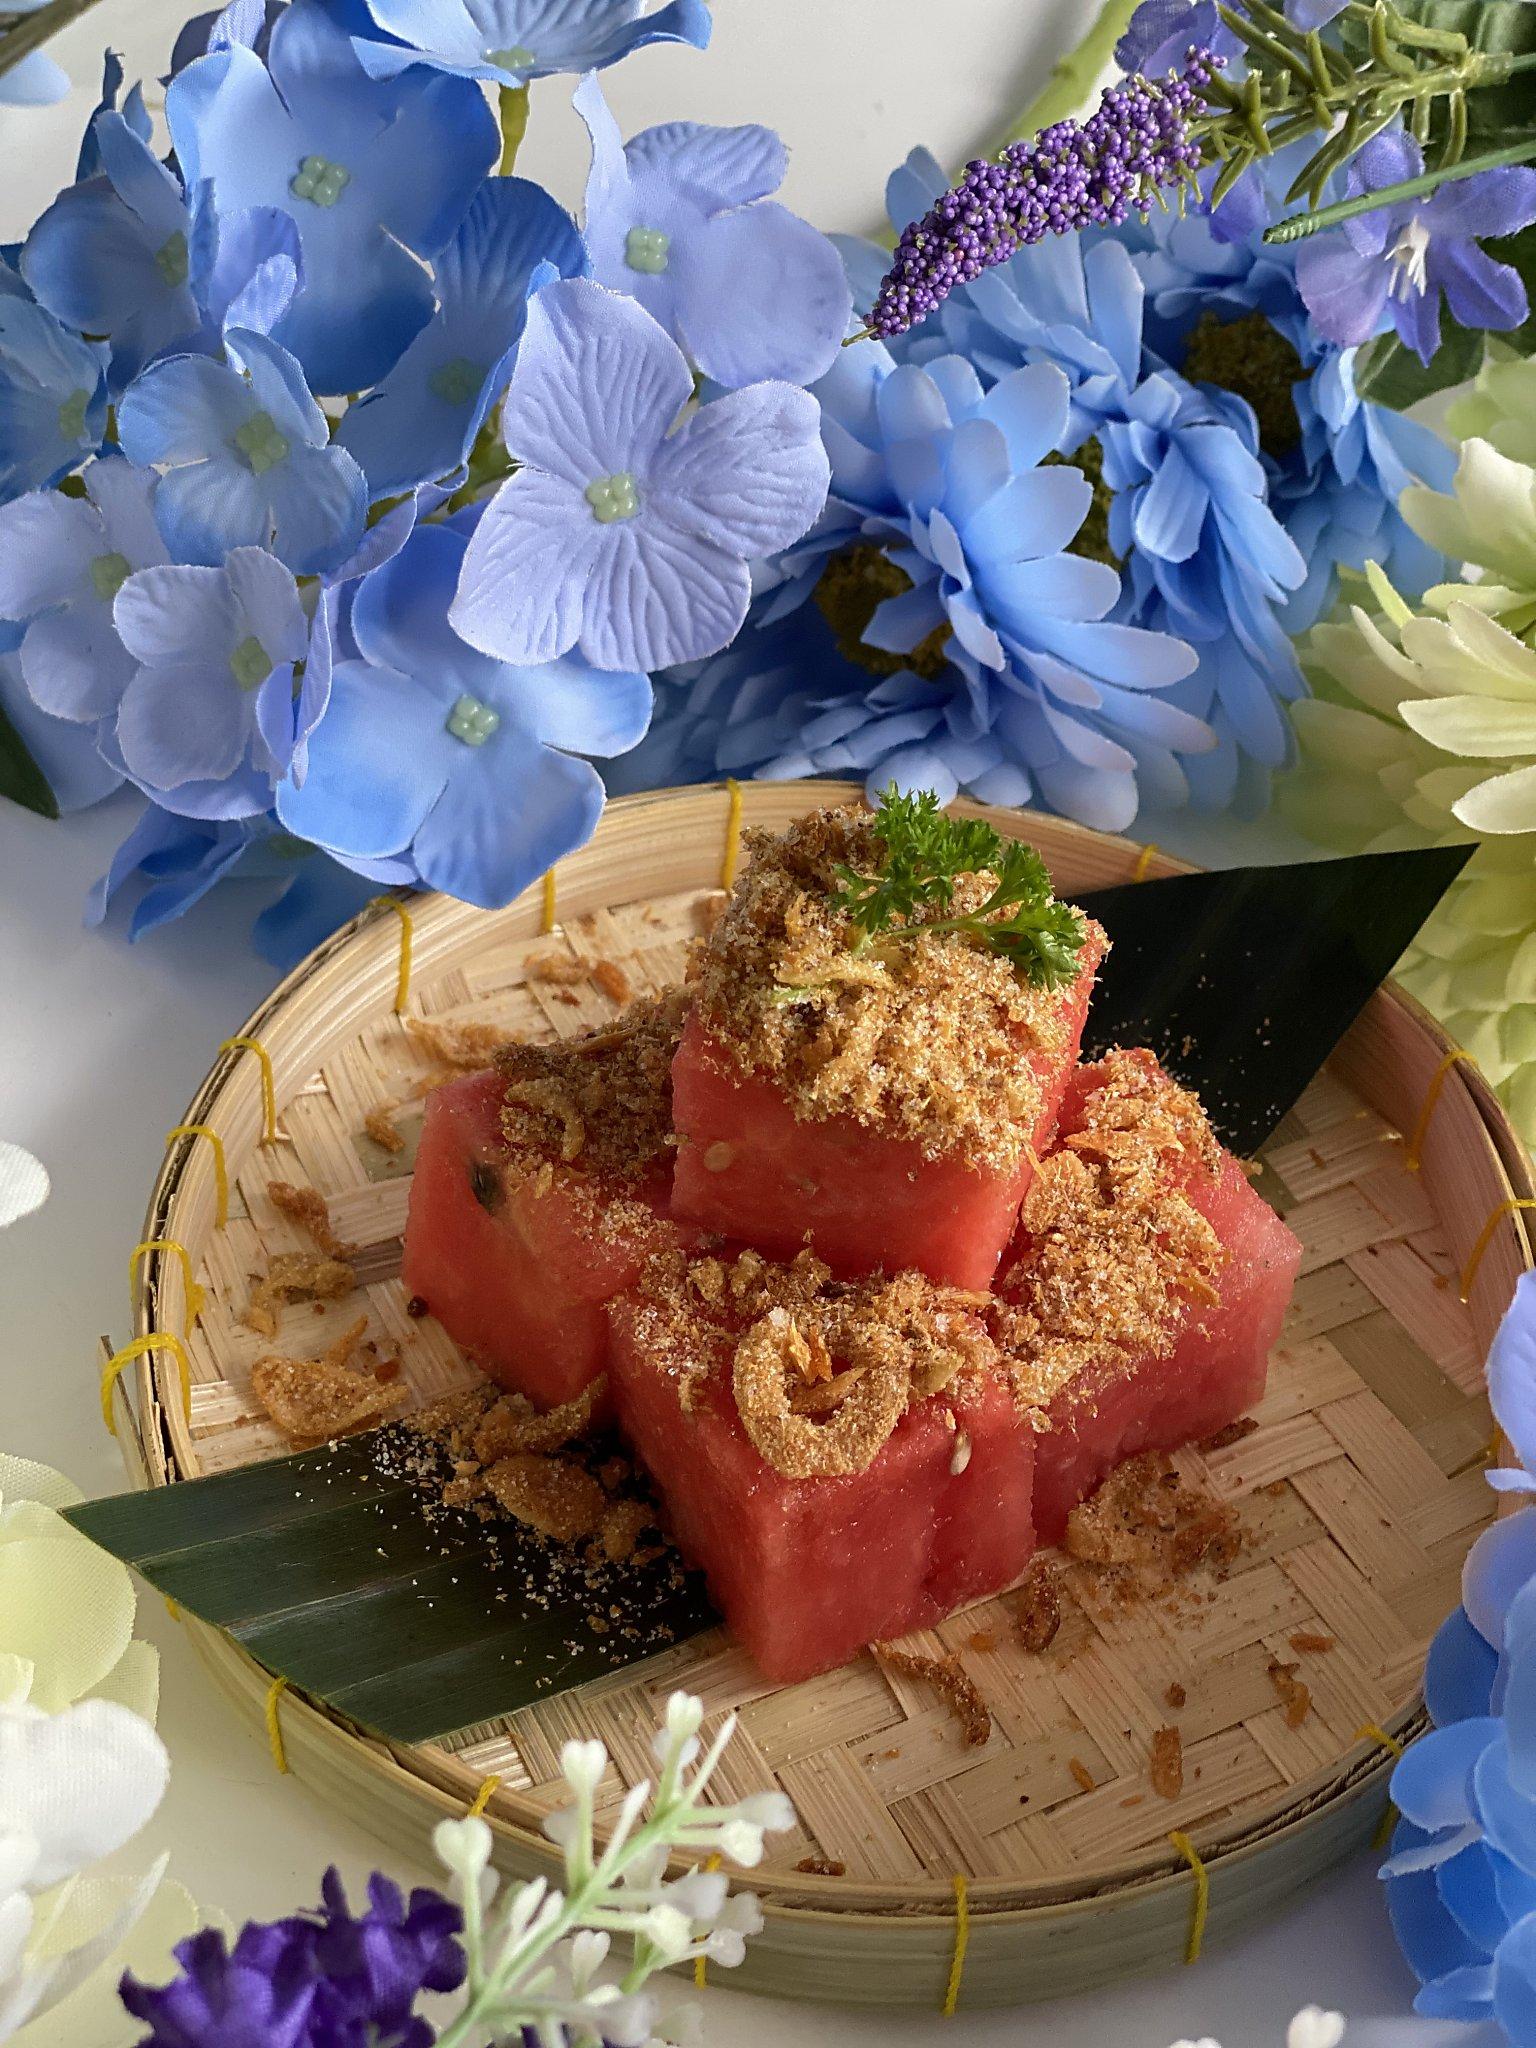 San Francisco's new Le Moon Thai Eatery offers alternative take on Thai